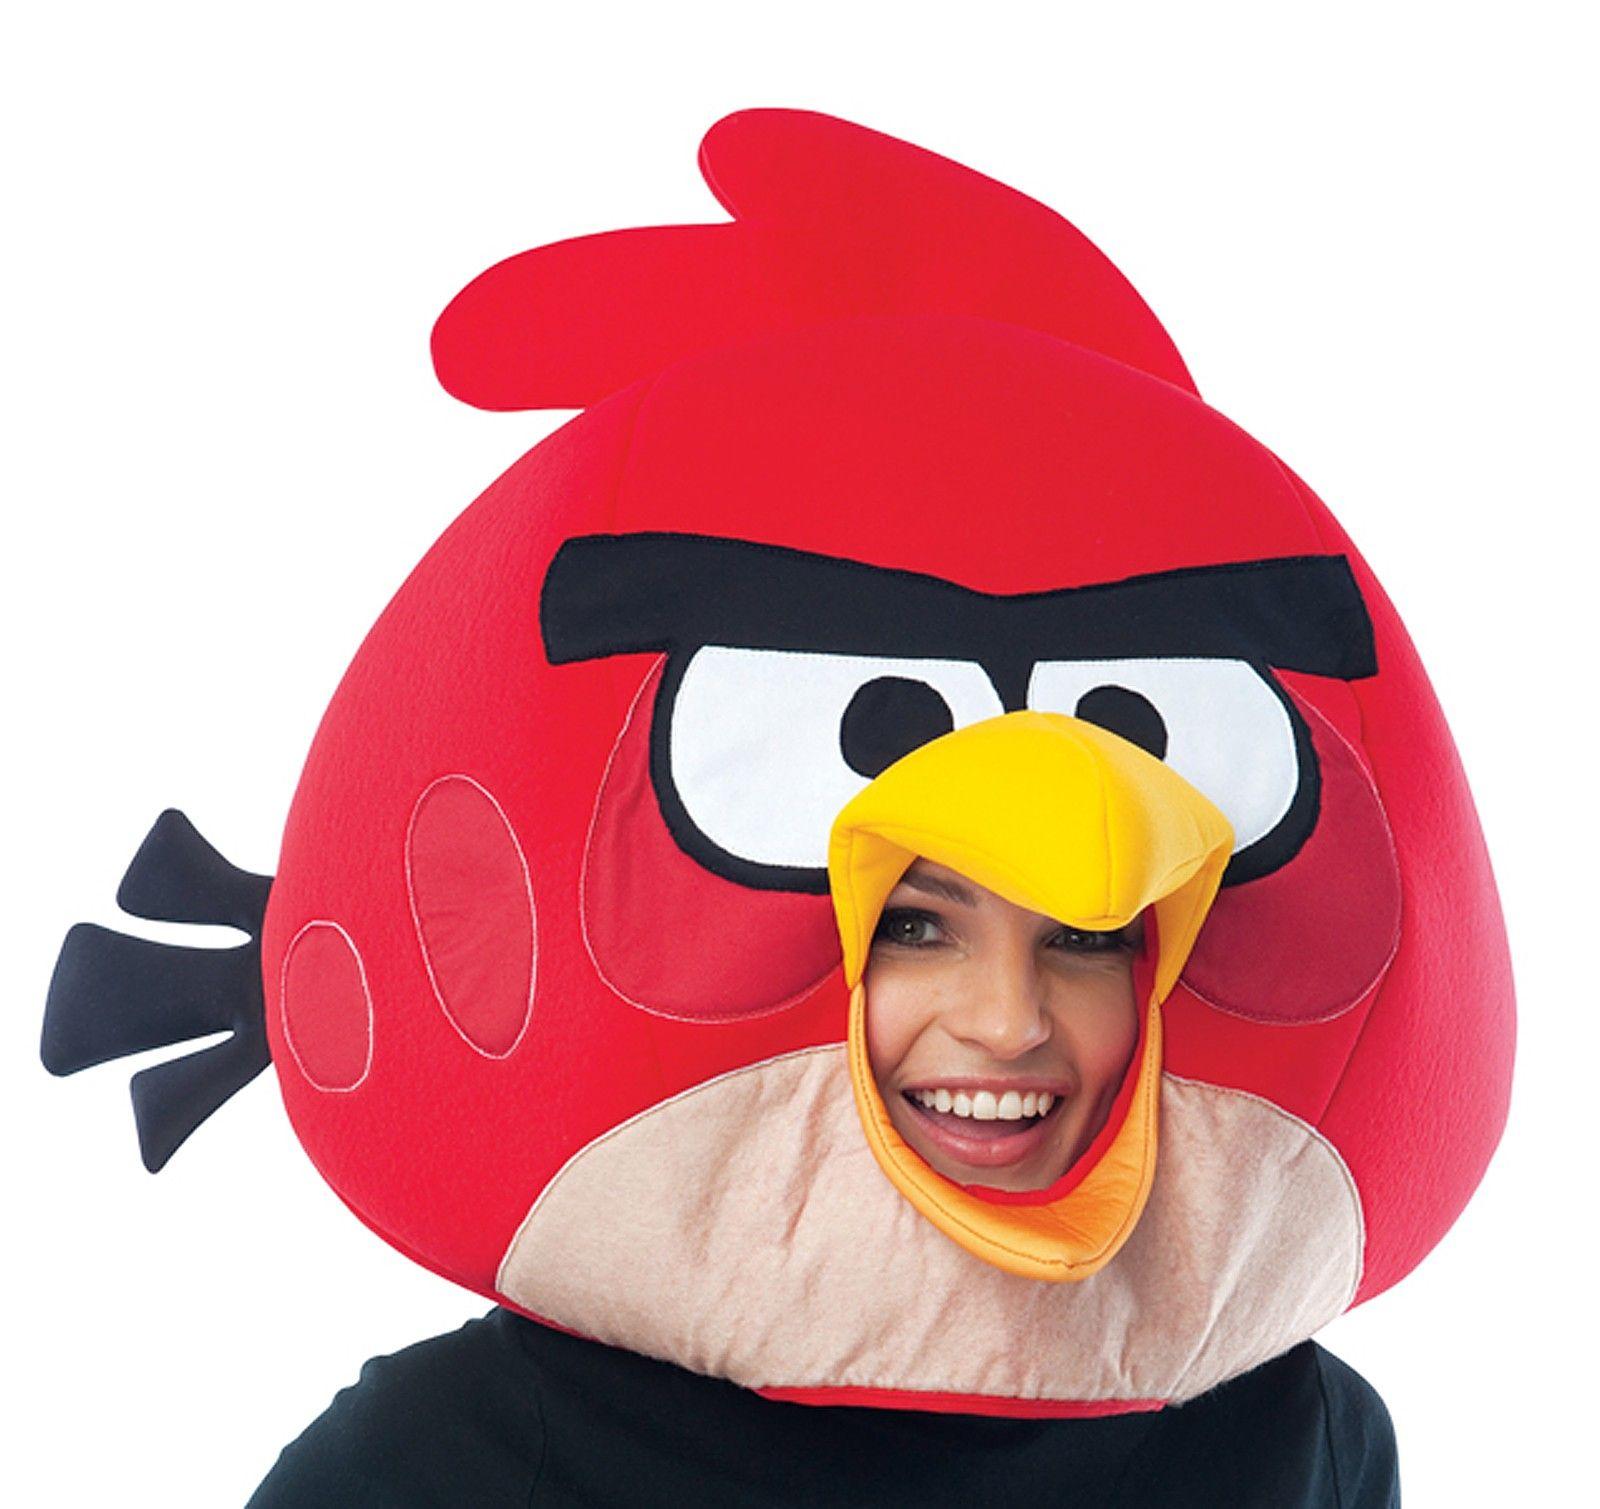 Rovio Angry Birds Red Angry Bird Costume Mask | Angry Birds ...